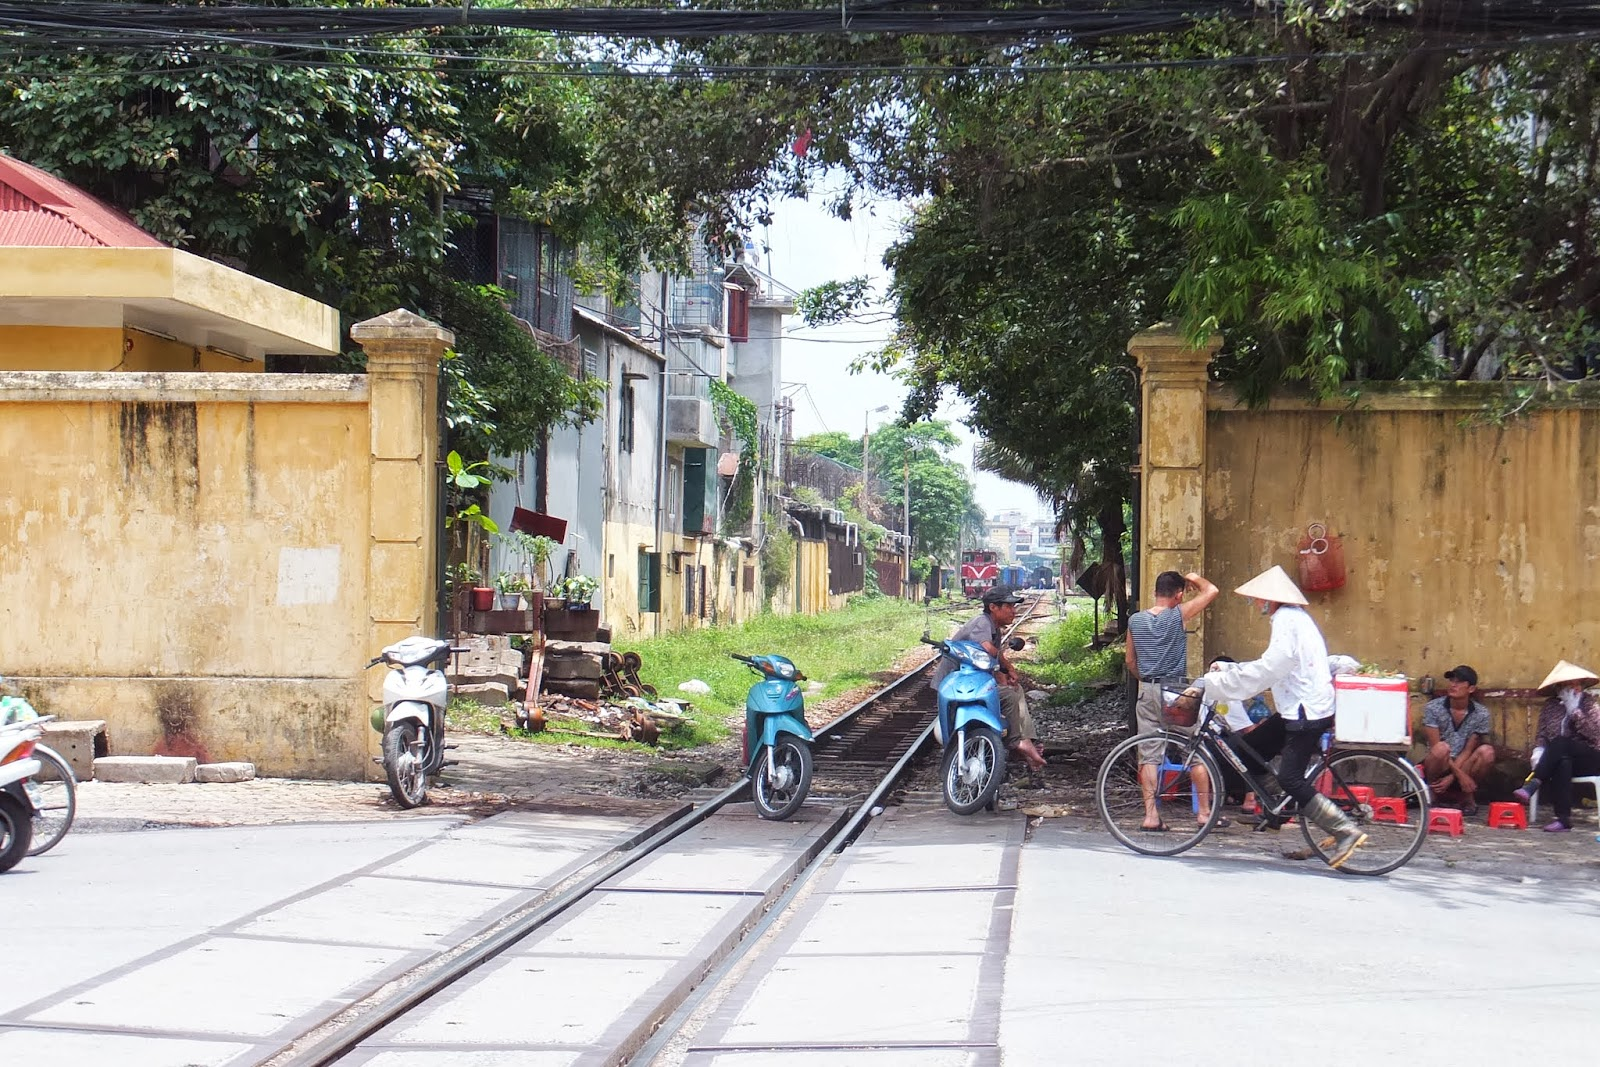 hanoi-railway-crossing ハノイ駅近くの踏切